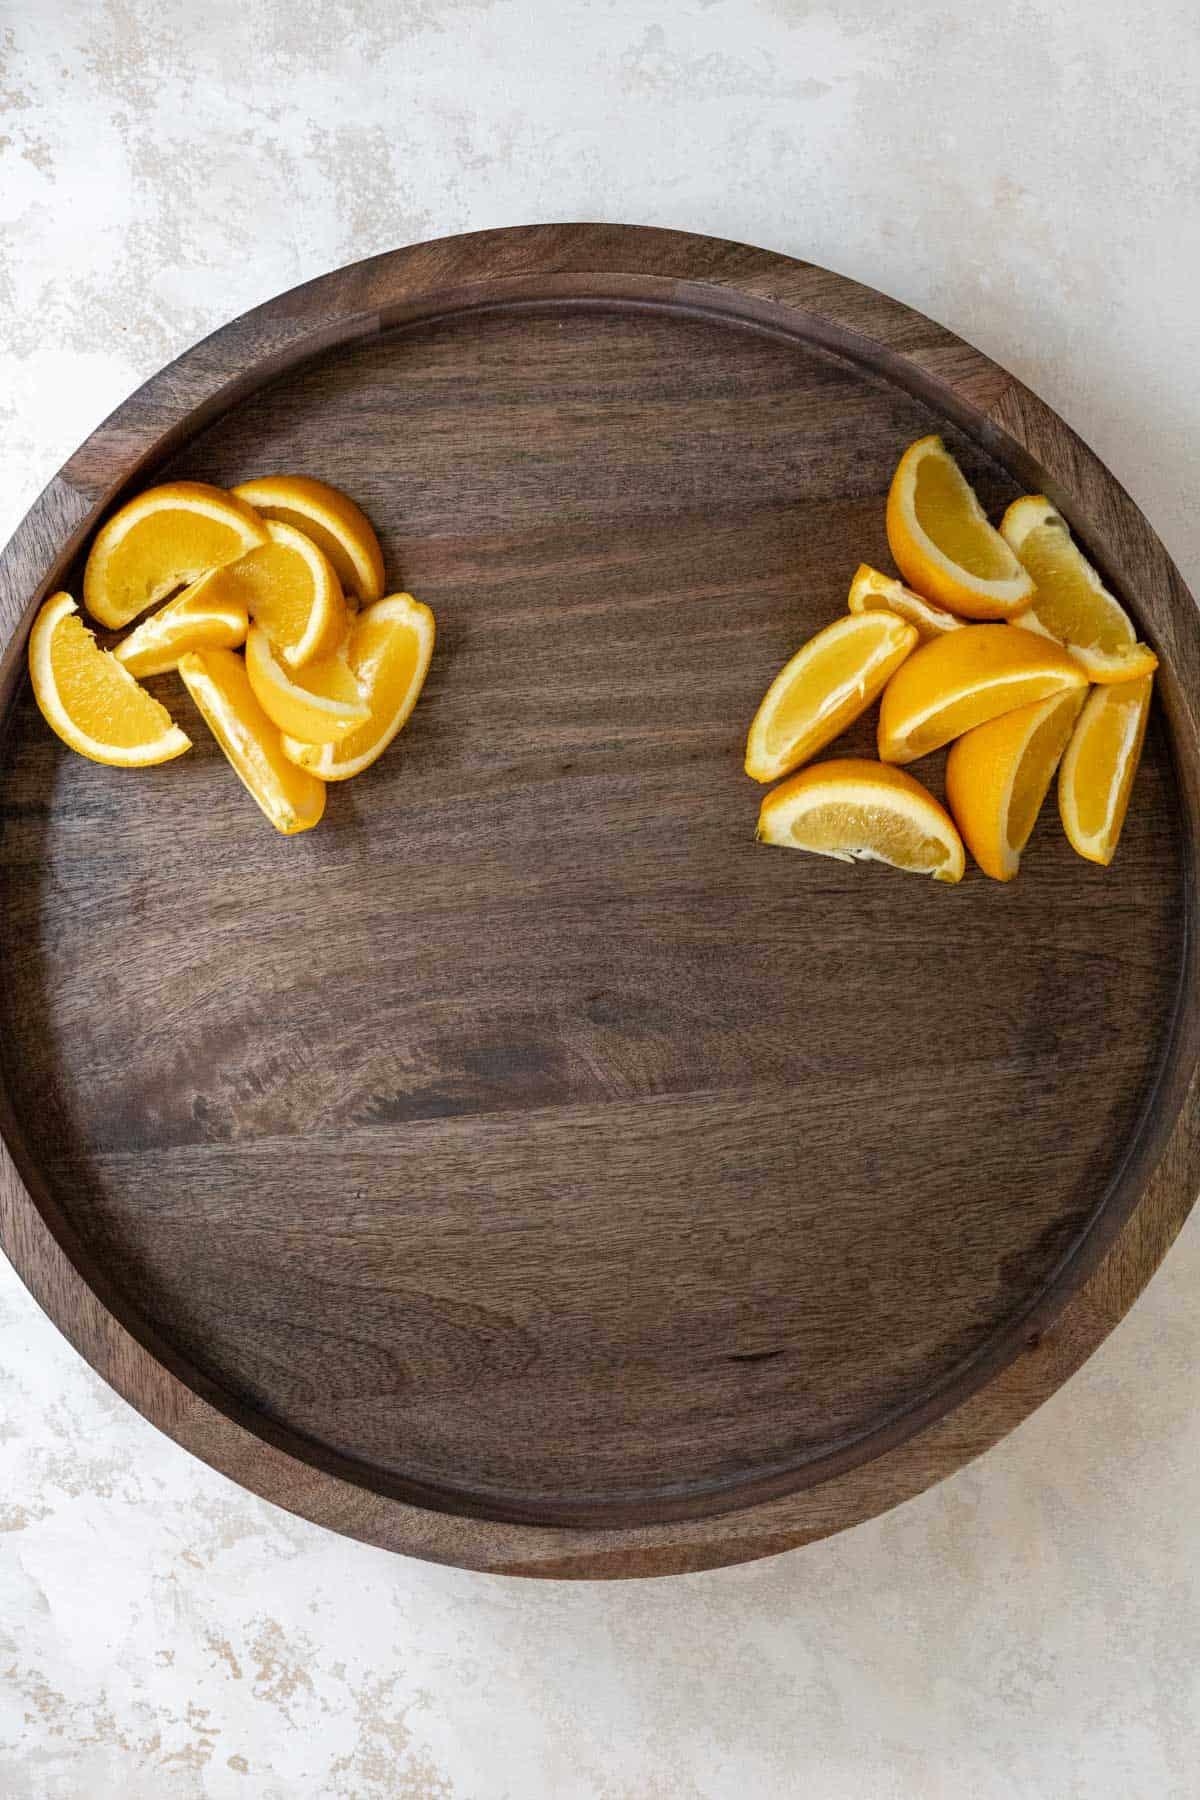 Orange wedges arranged on a wooden board.